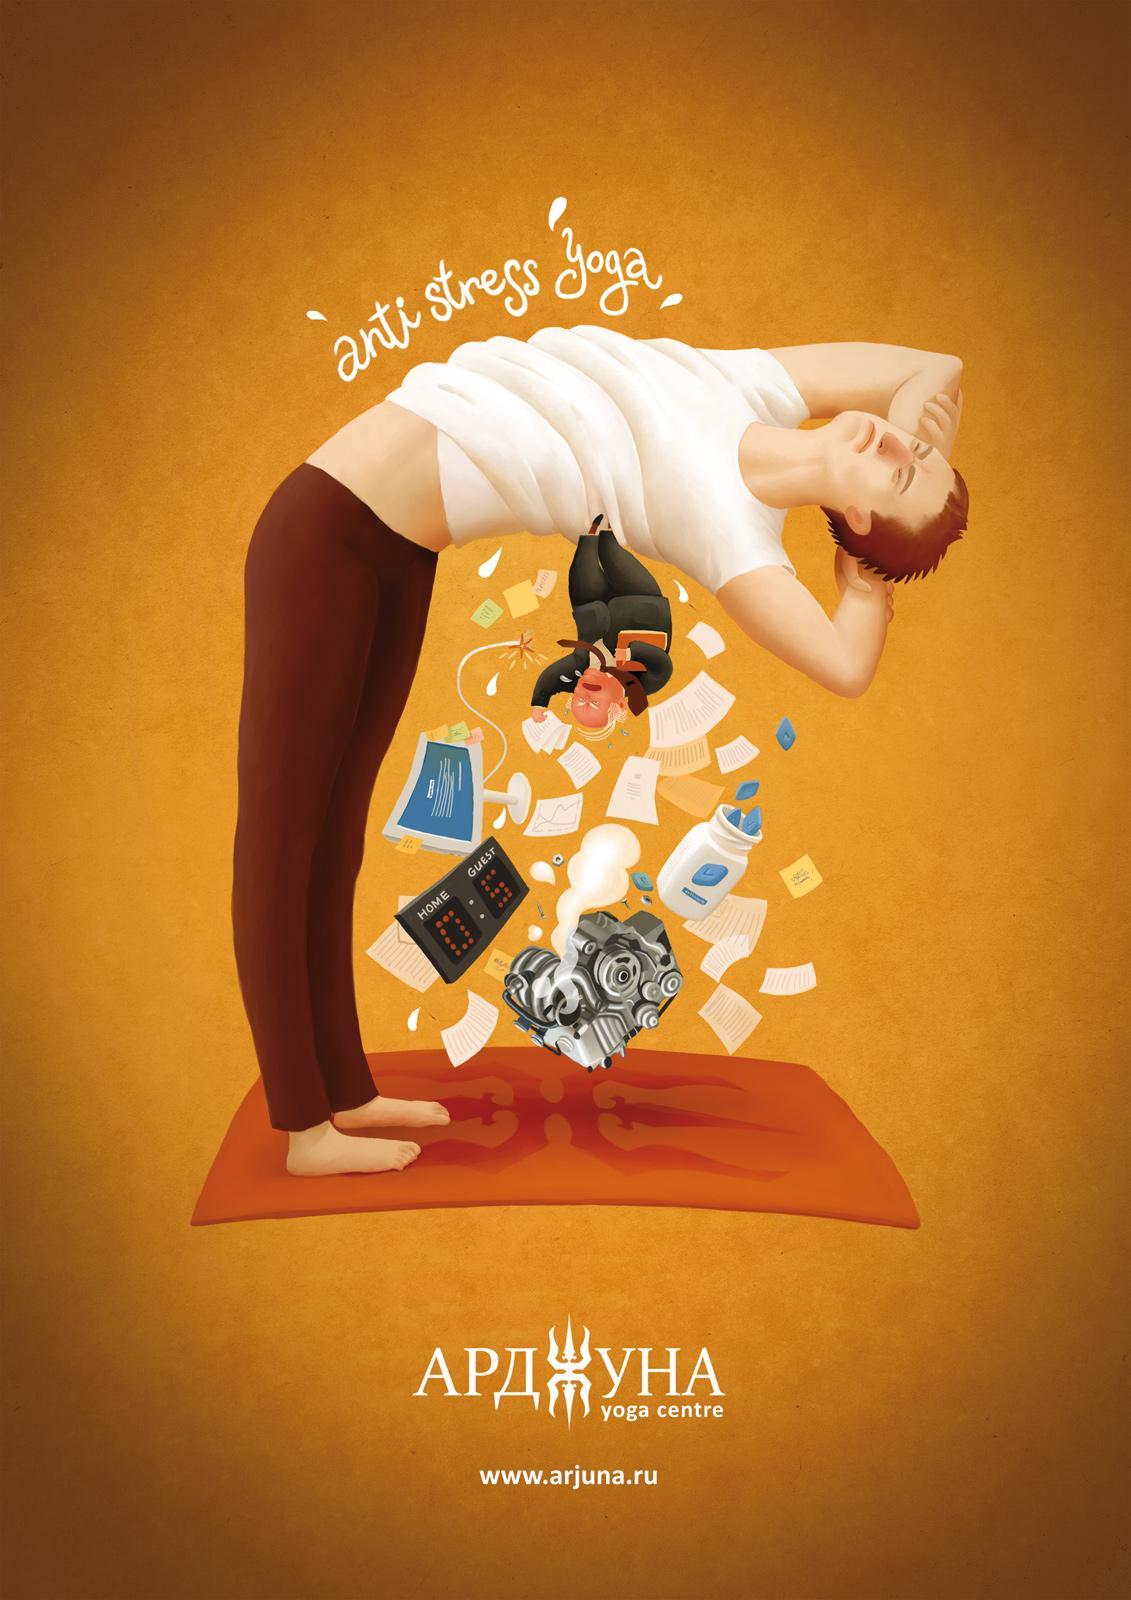 Arjuna yoga centre Print Ad -  Man